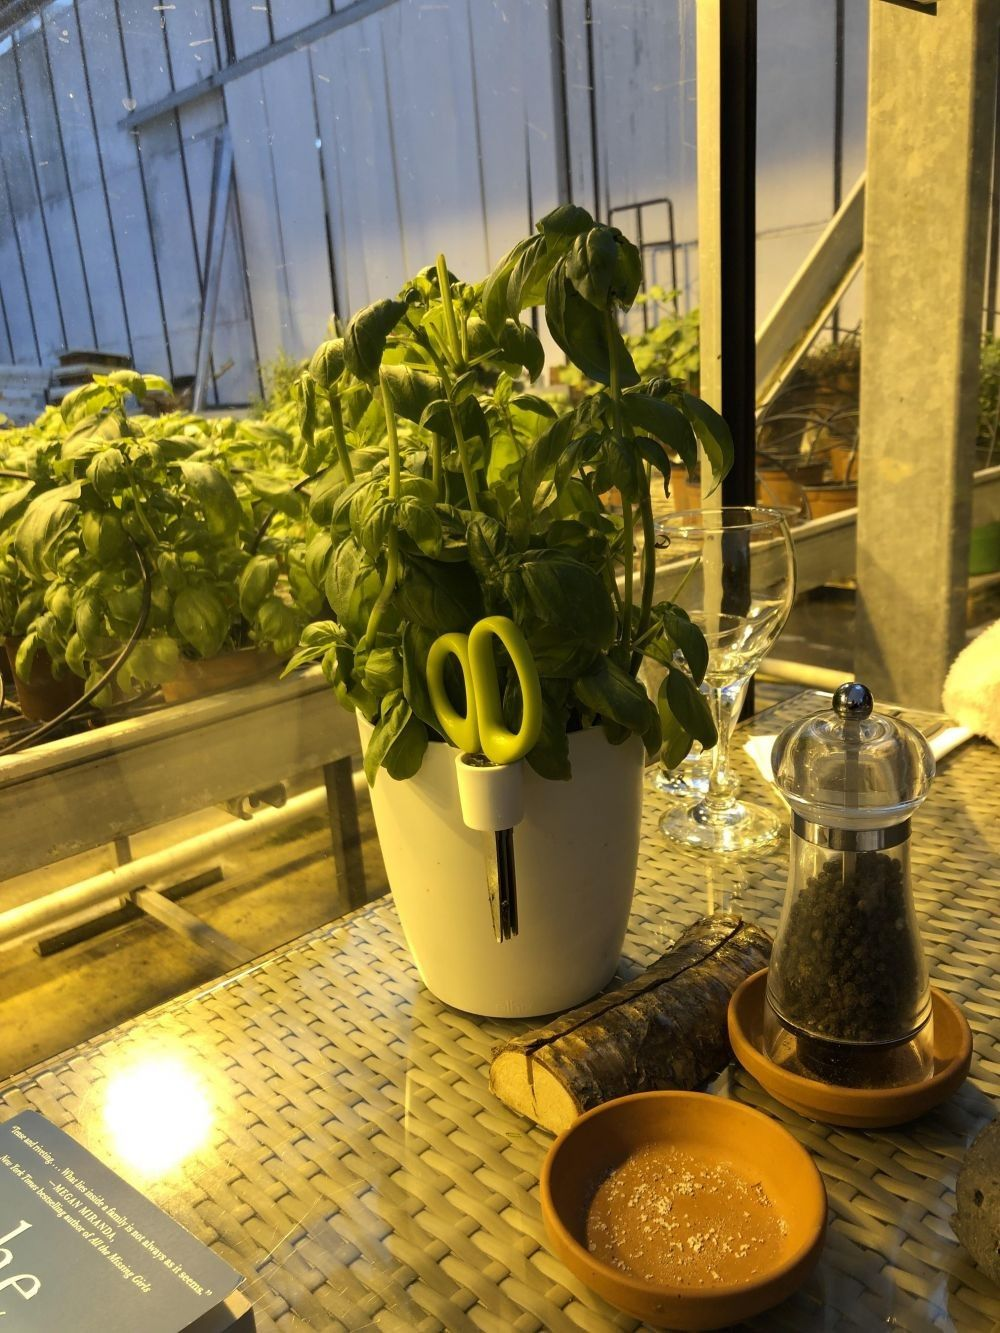 11 Inovasi Tempat Makan Ini Unik Banget, Idenya Brilian dan Helpful